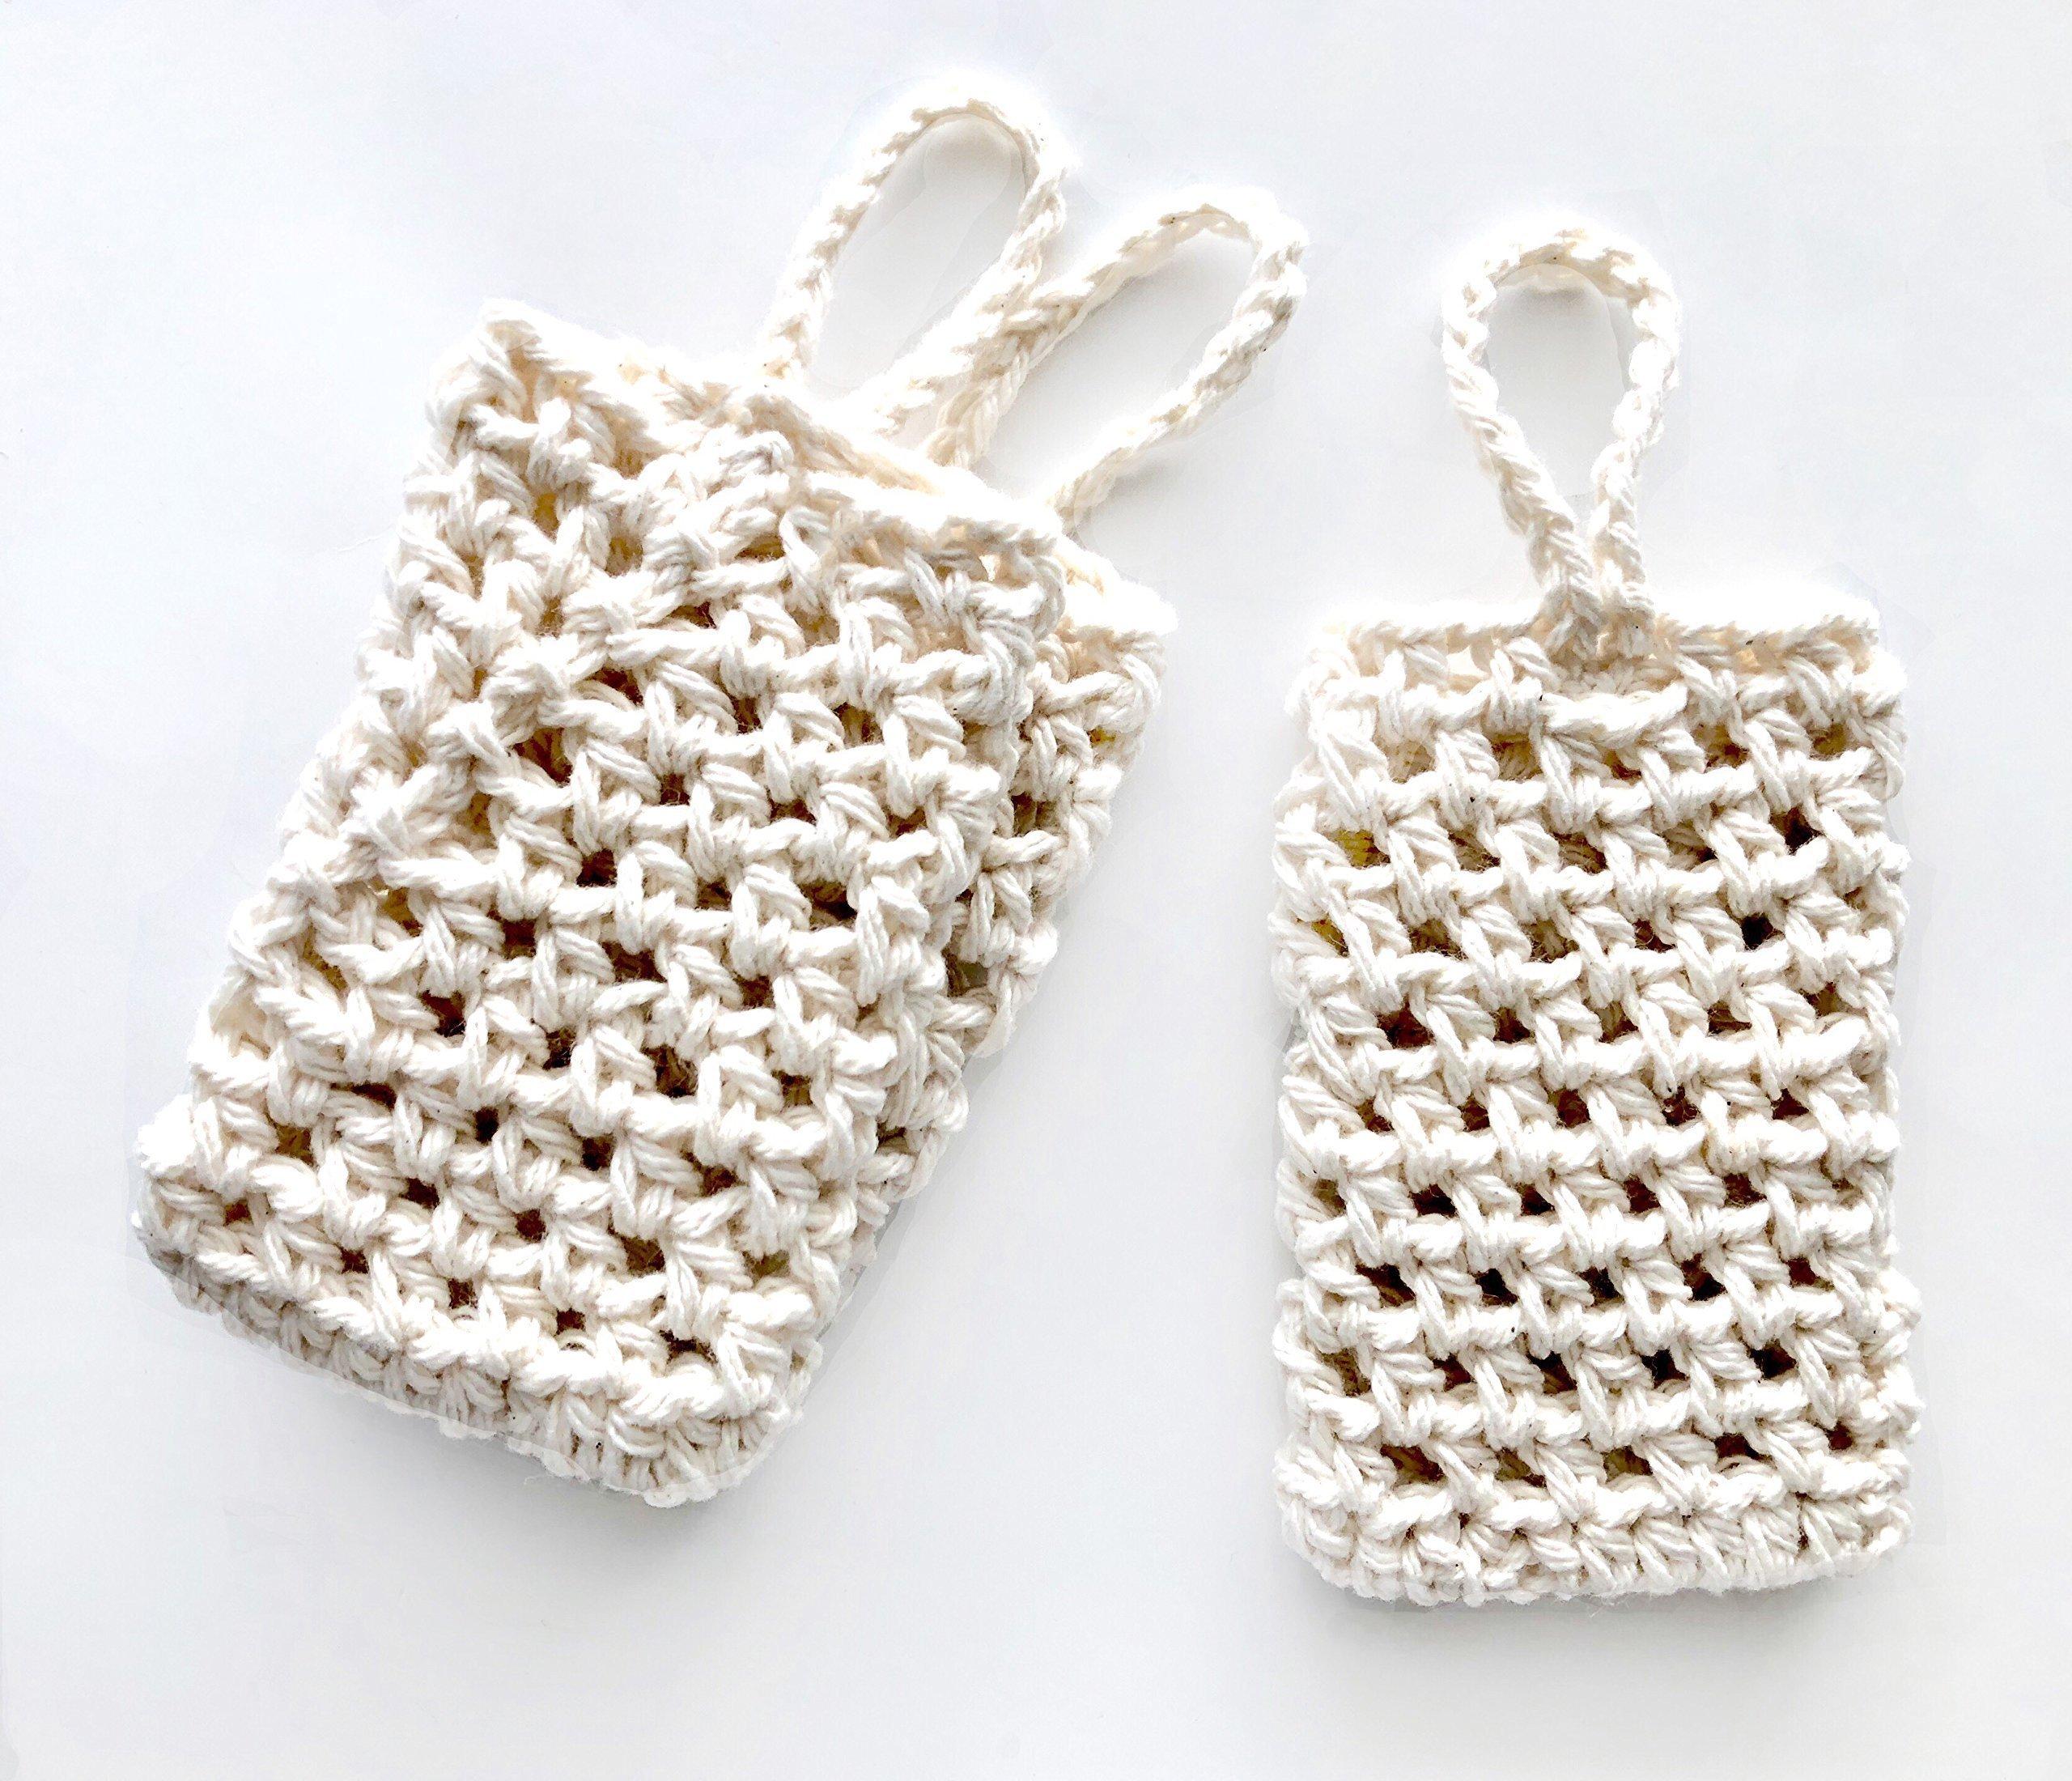 Handmade Crochet Off White Bath Soap Saver Set of 3